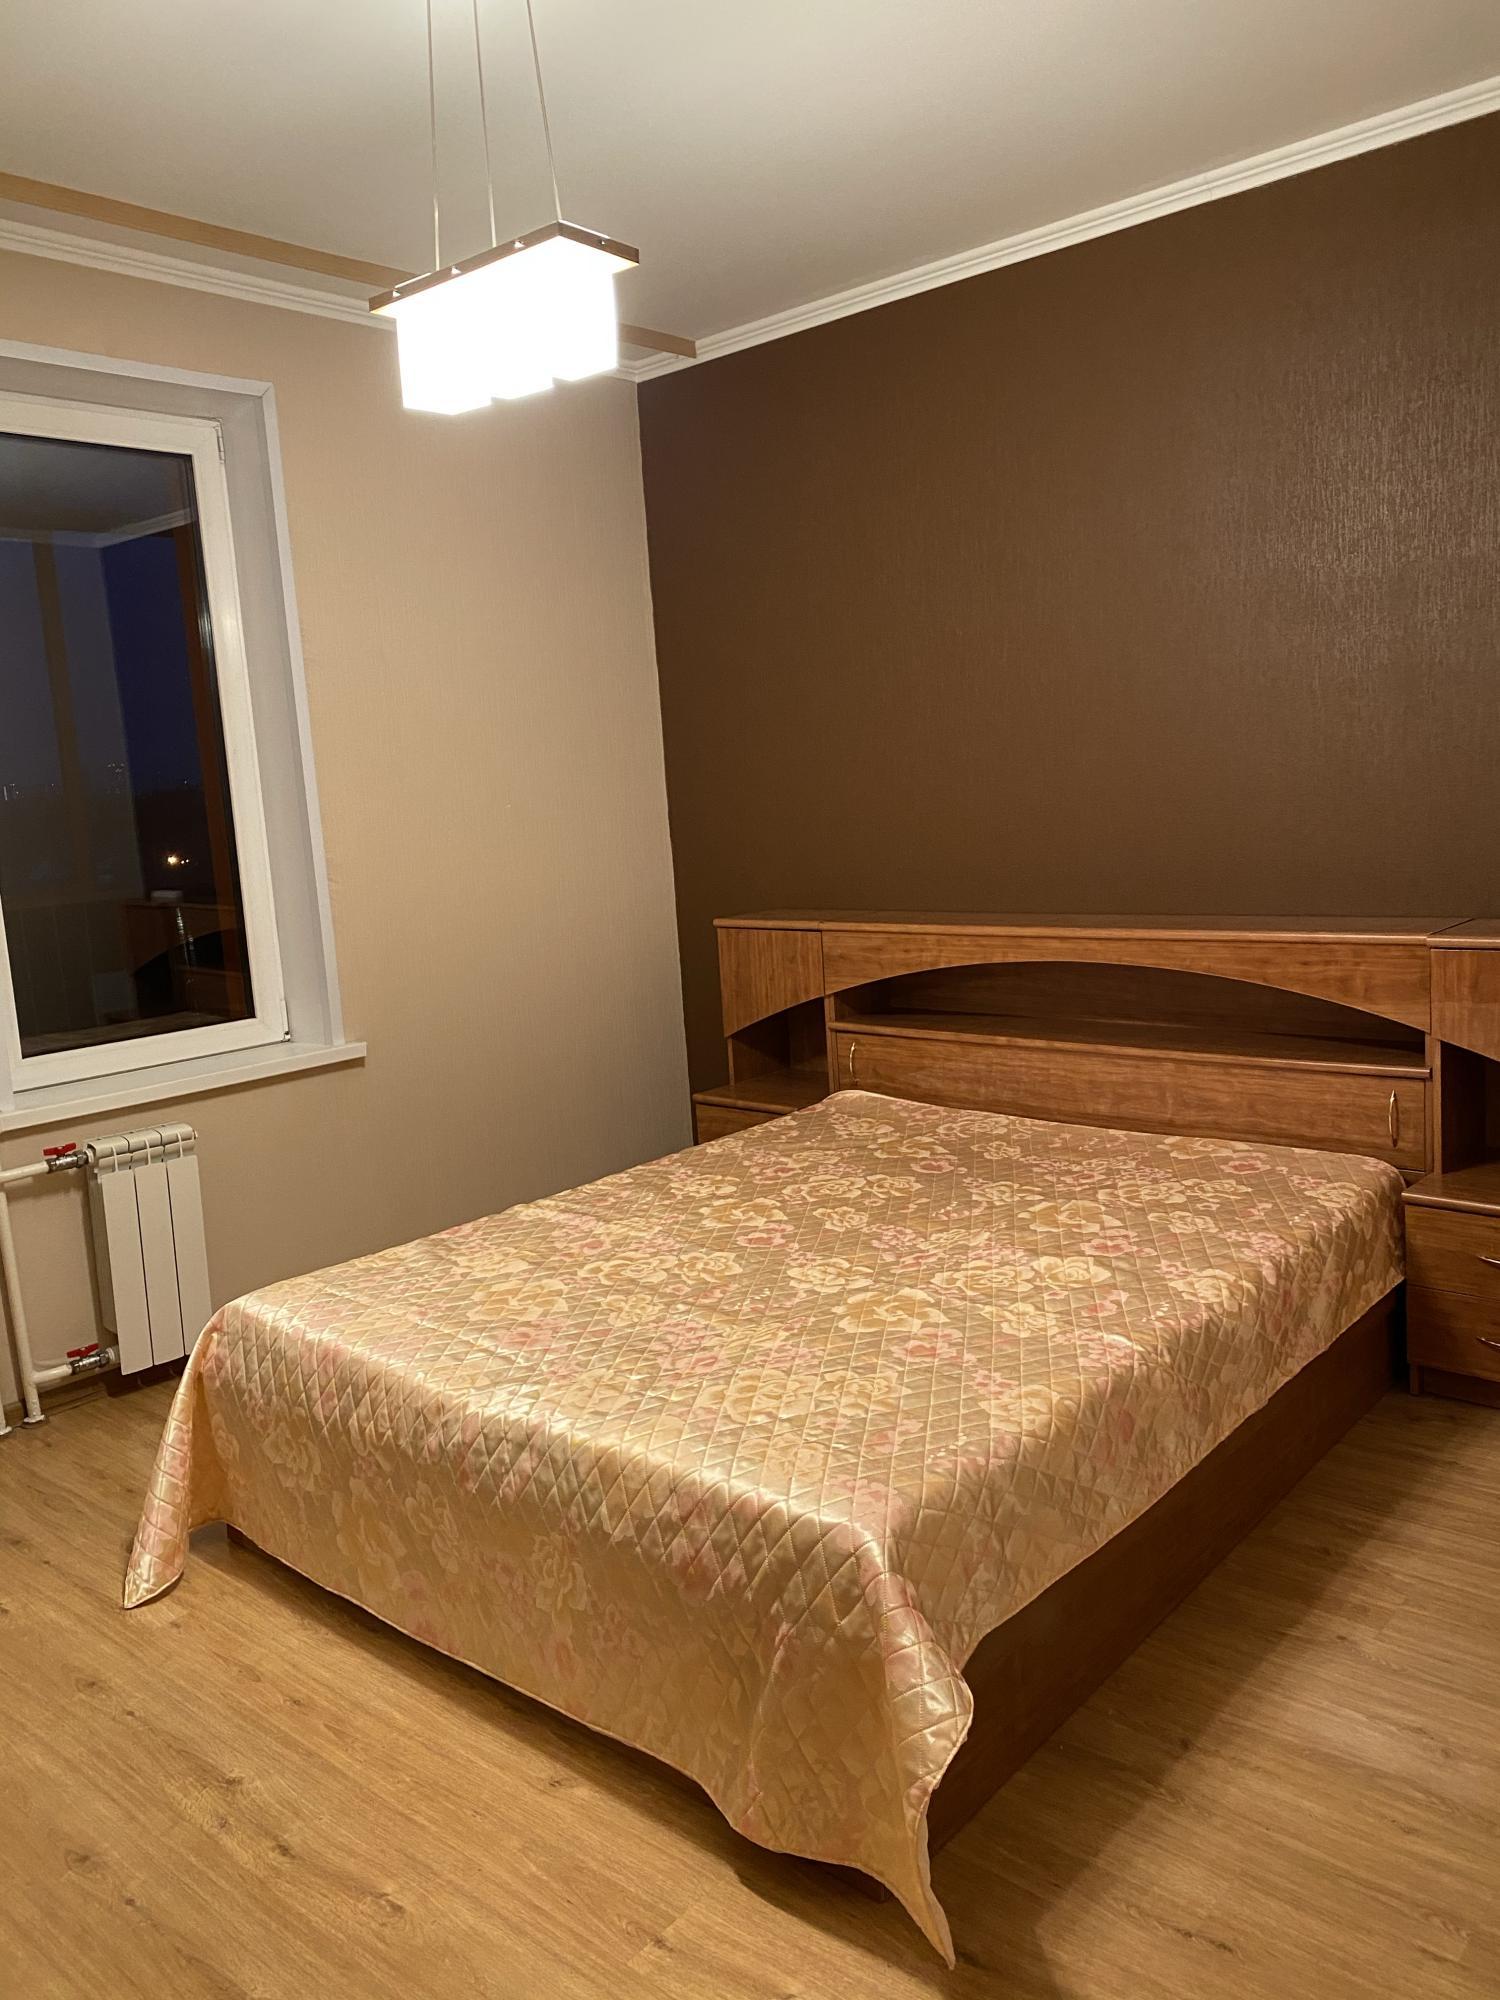 2к квартира Капитанская улица, 6 | 30000 | аренда в Красноярске фото 1